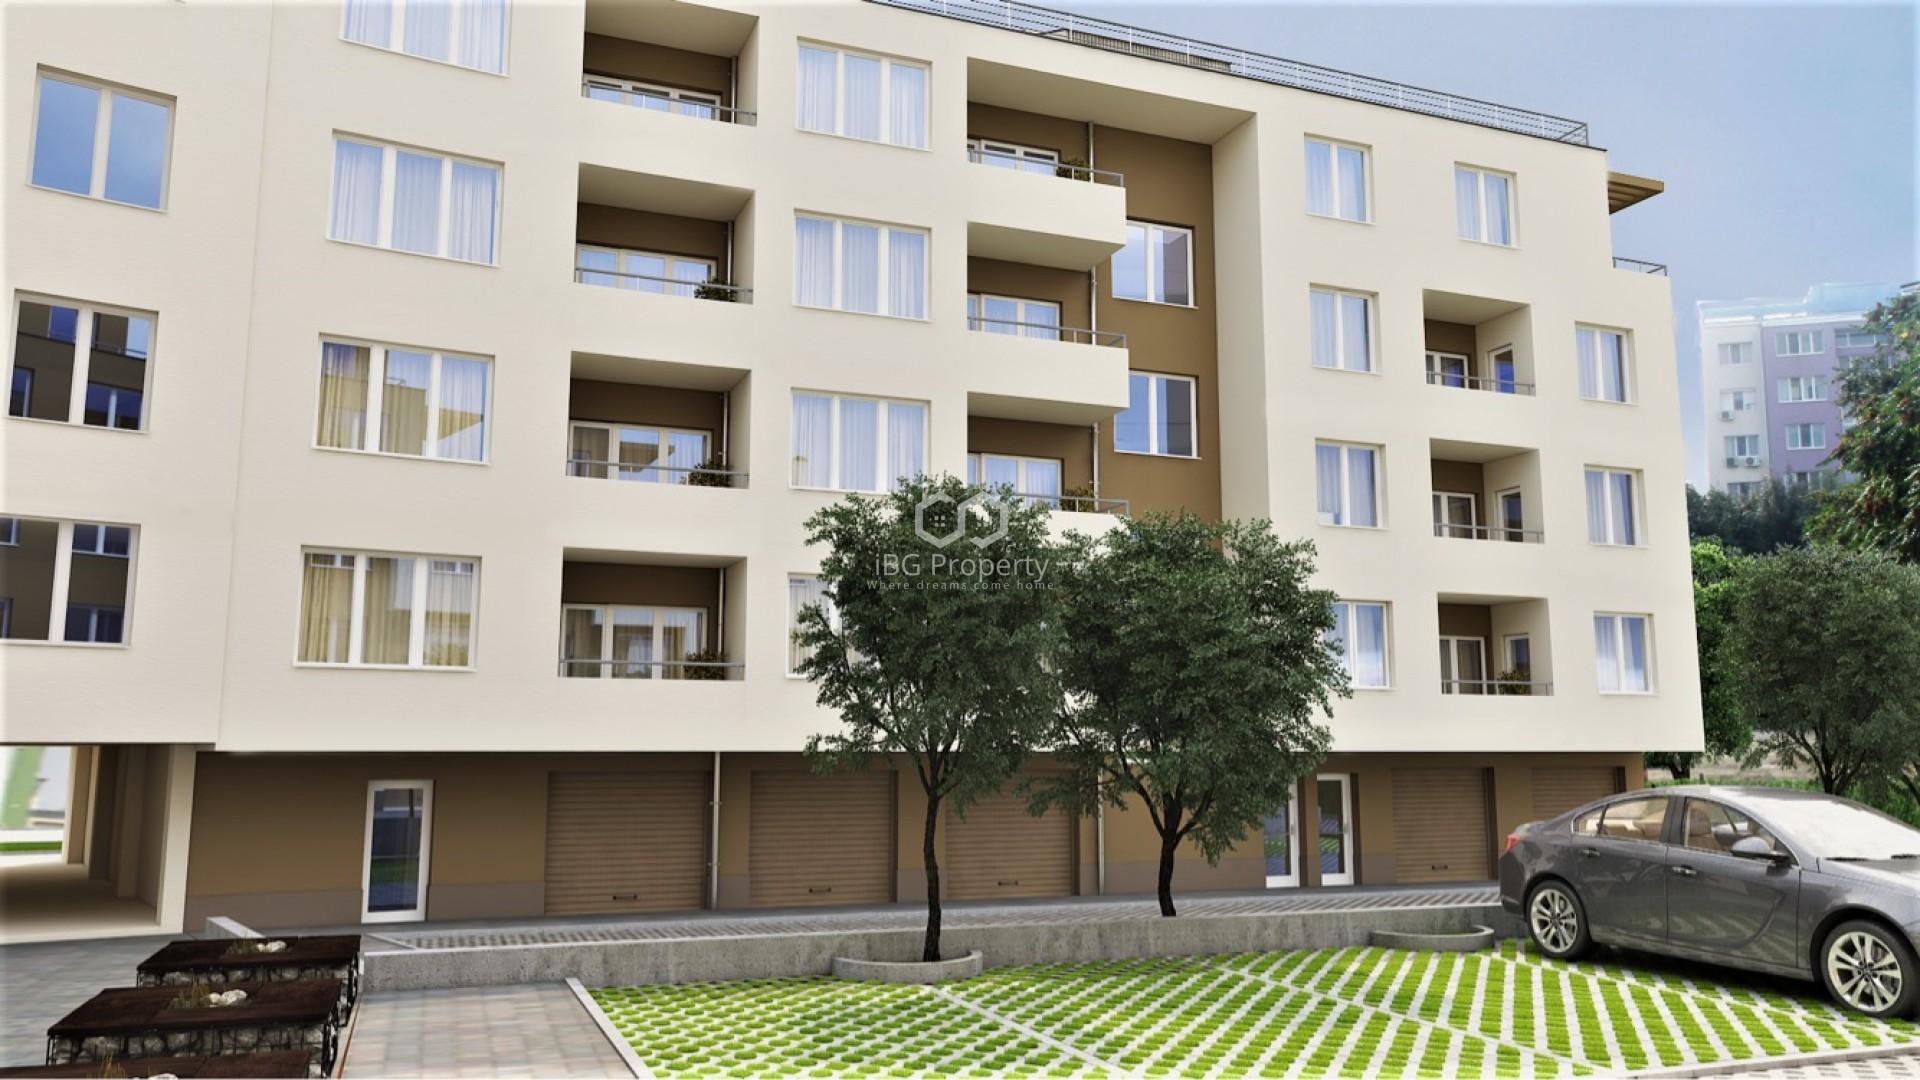 Тристаен апартамент  Бургас 78,94 m2